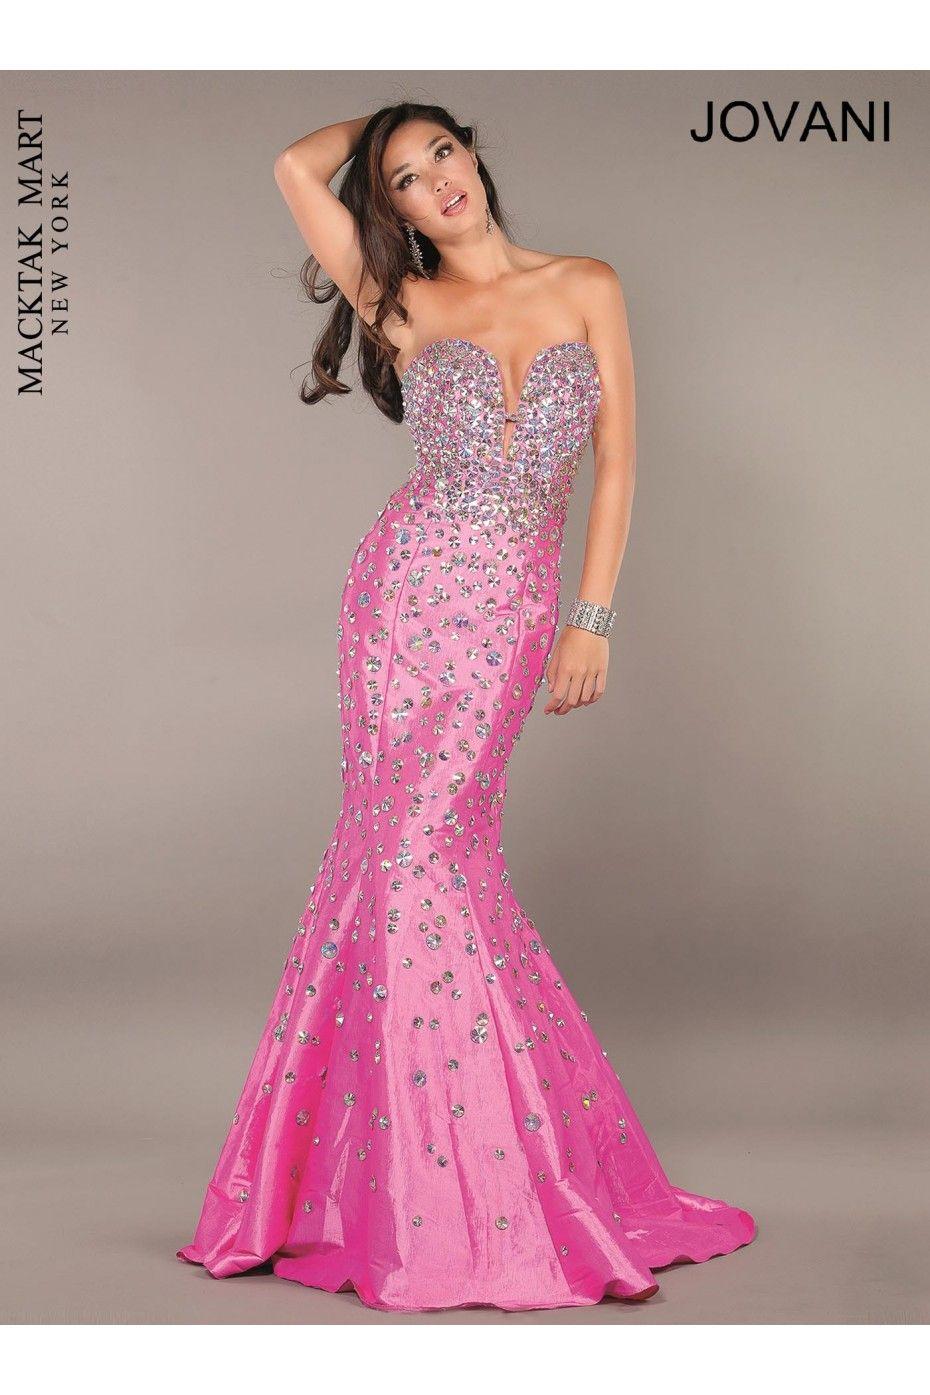 Pink mermaid prom dress uk long - Boulcom dress style 2018